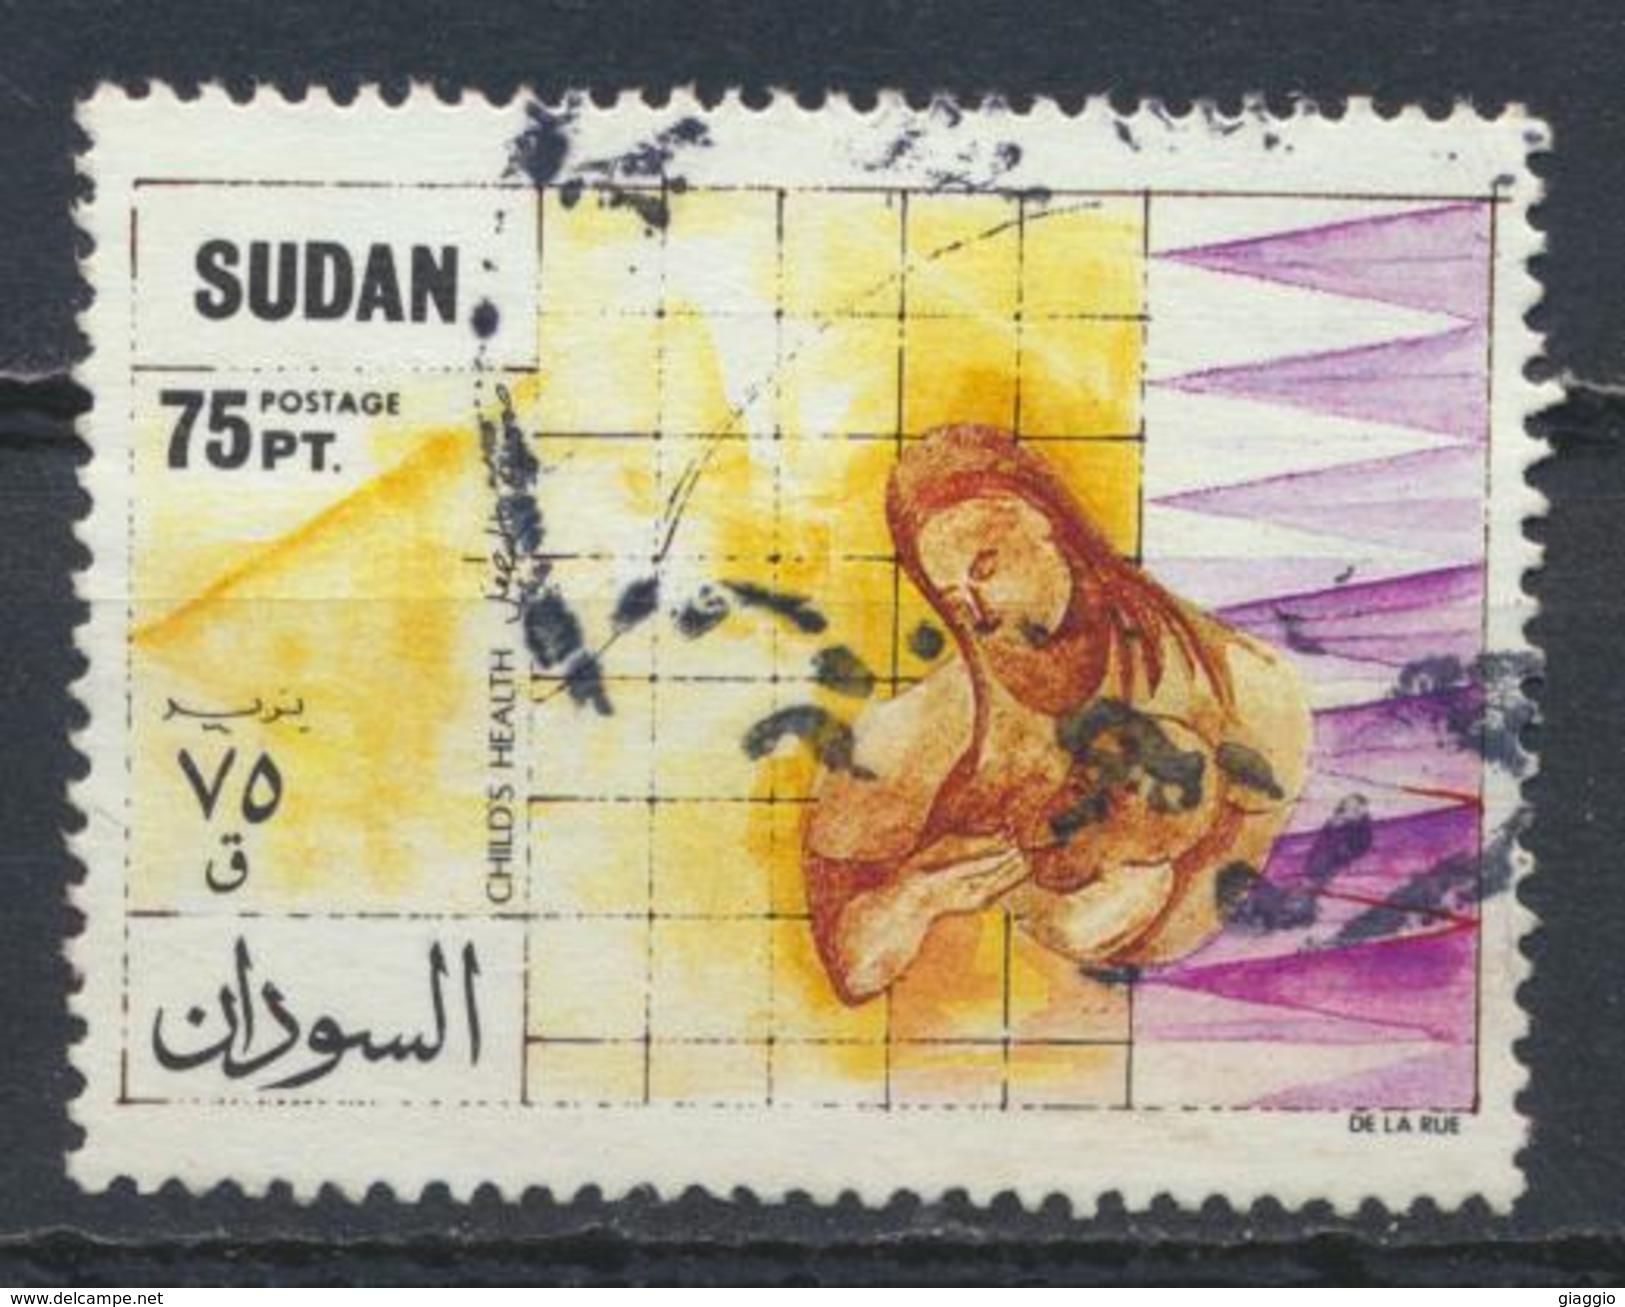 °°° LOT SUDAN SOUDAN - Y&T N°353 - 1988 °°° - Sudan (1954-...)